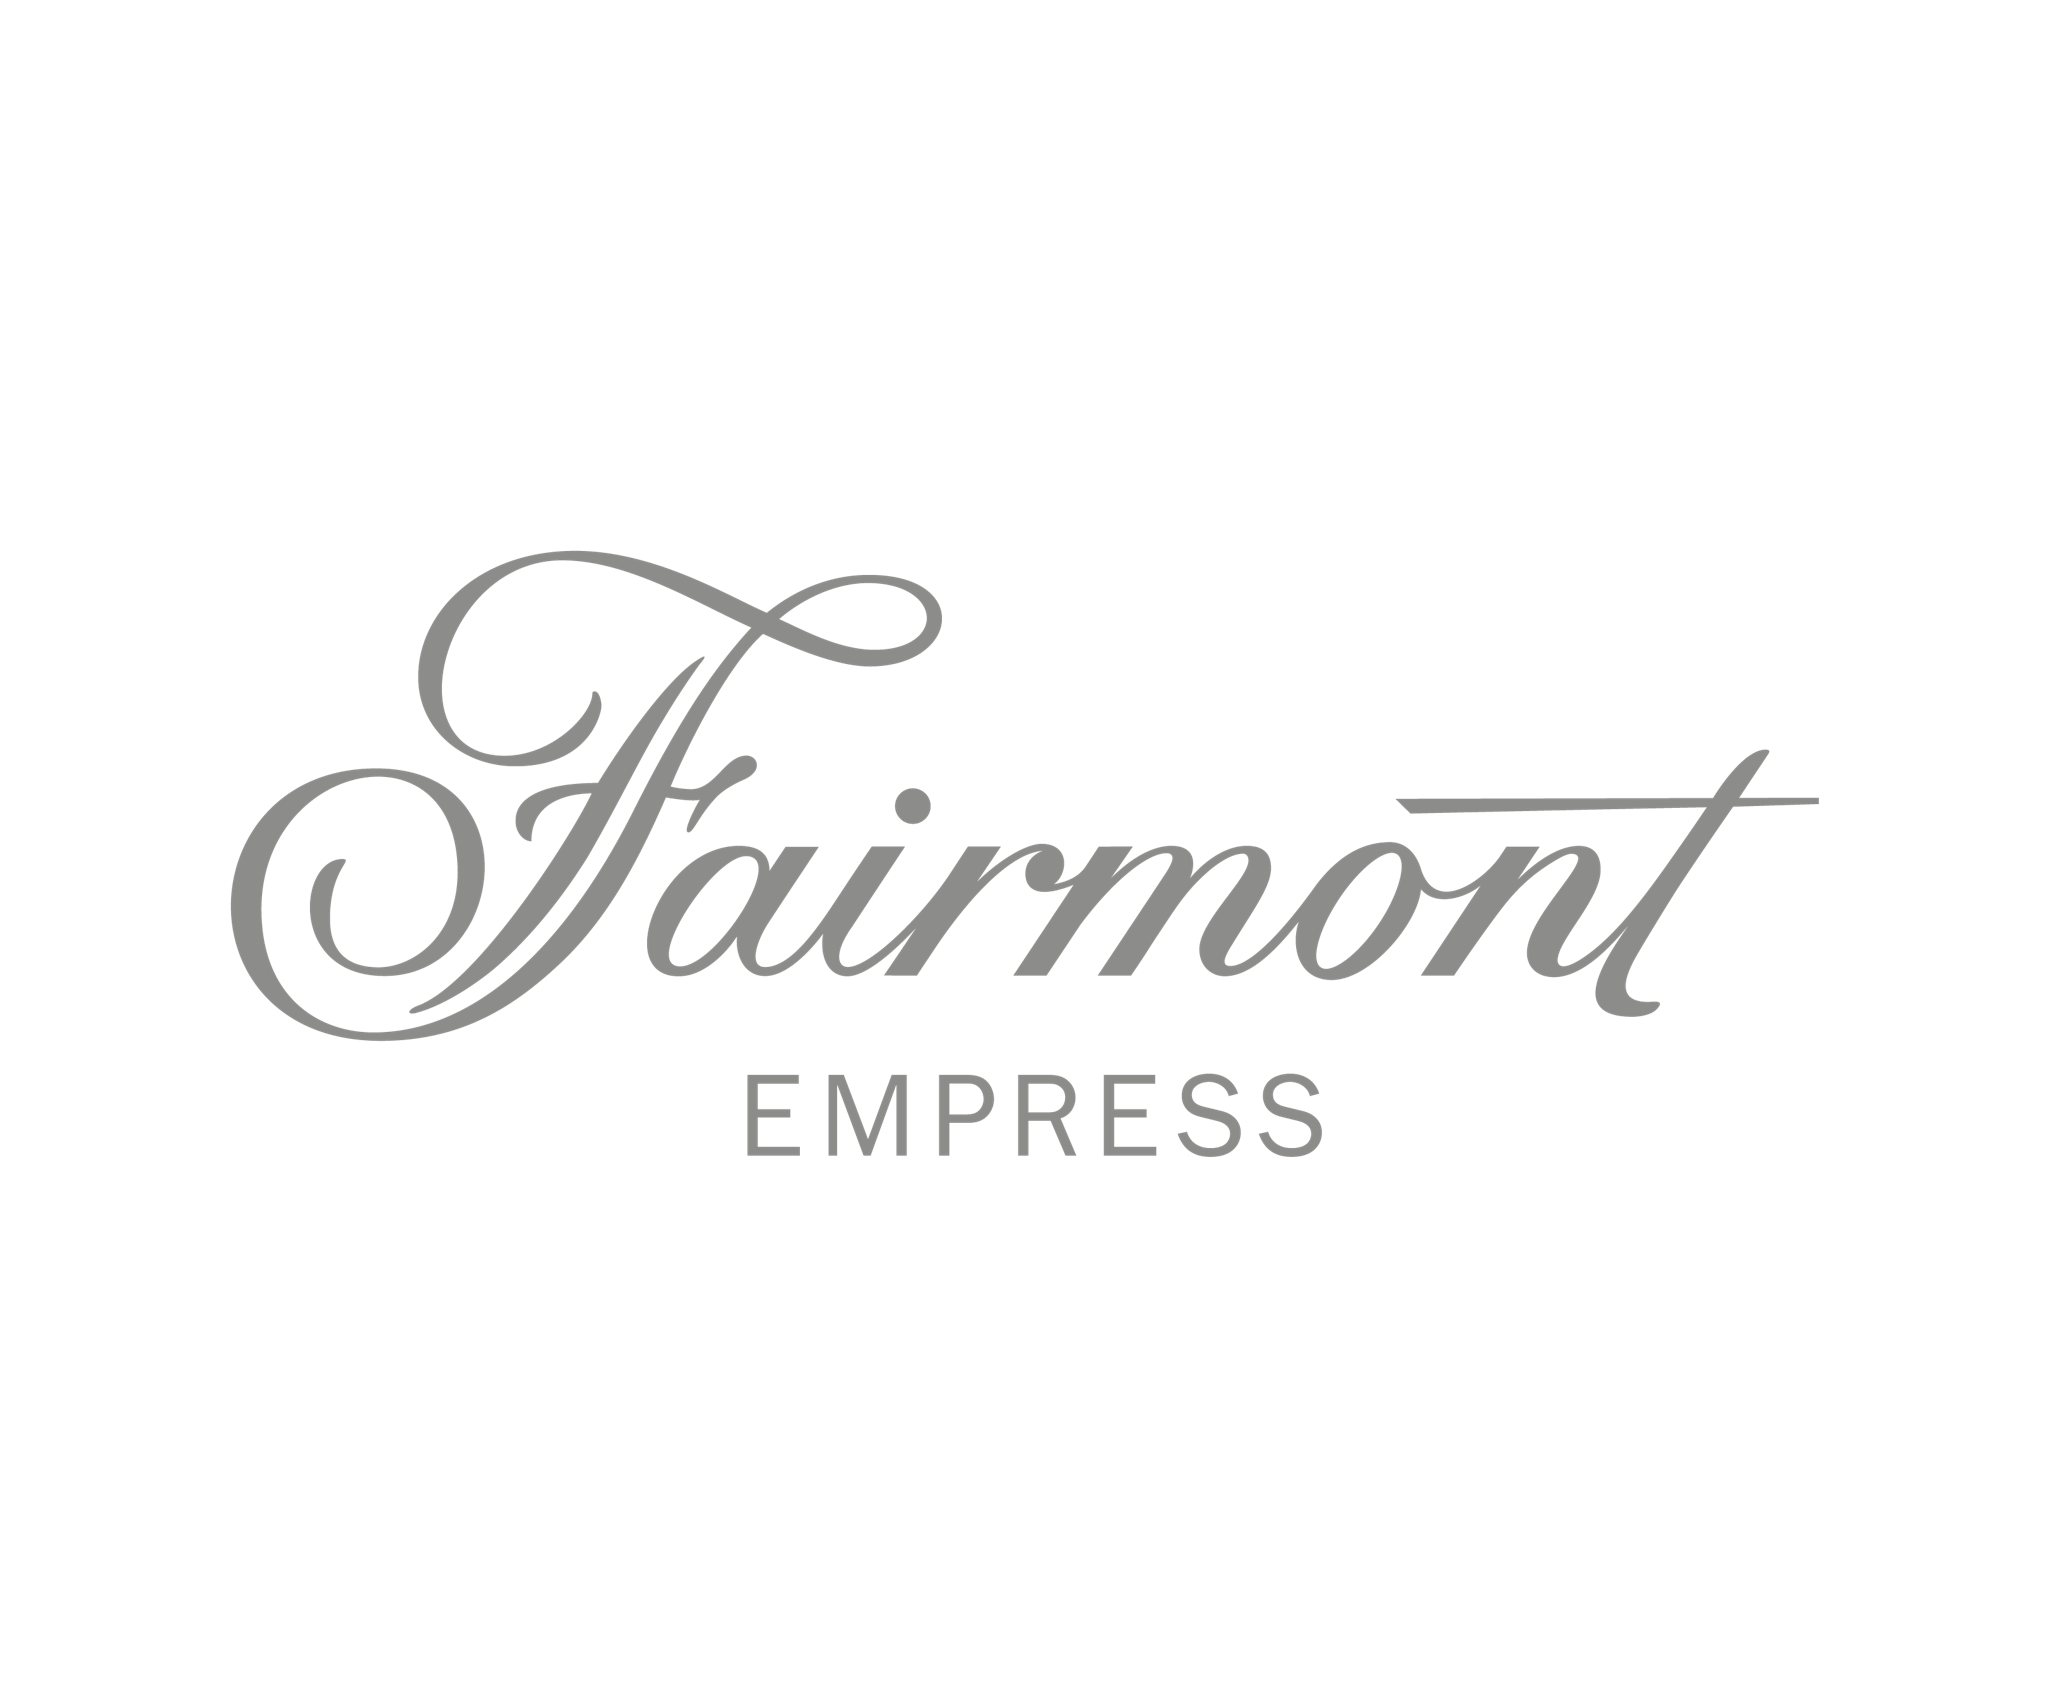 https://www.fairmont.com/empress-victoria/